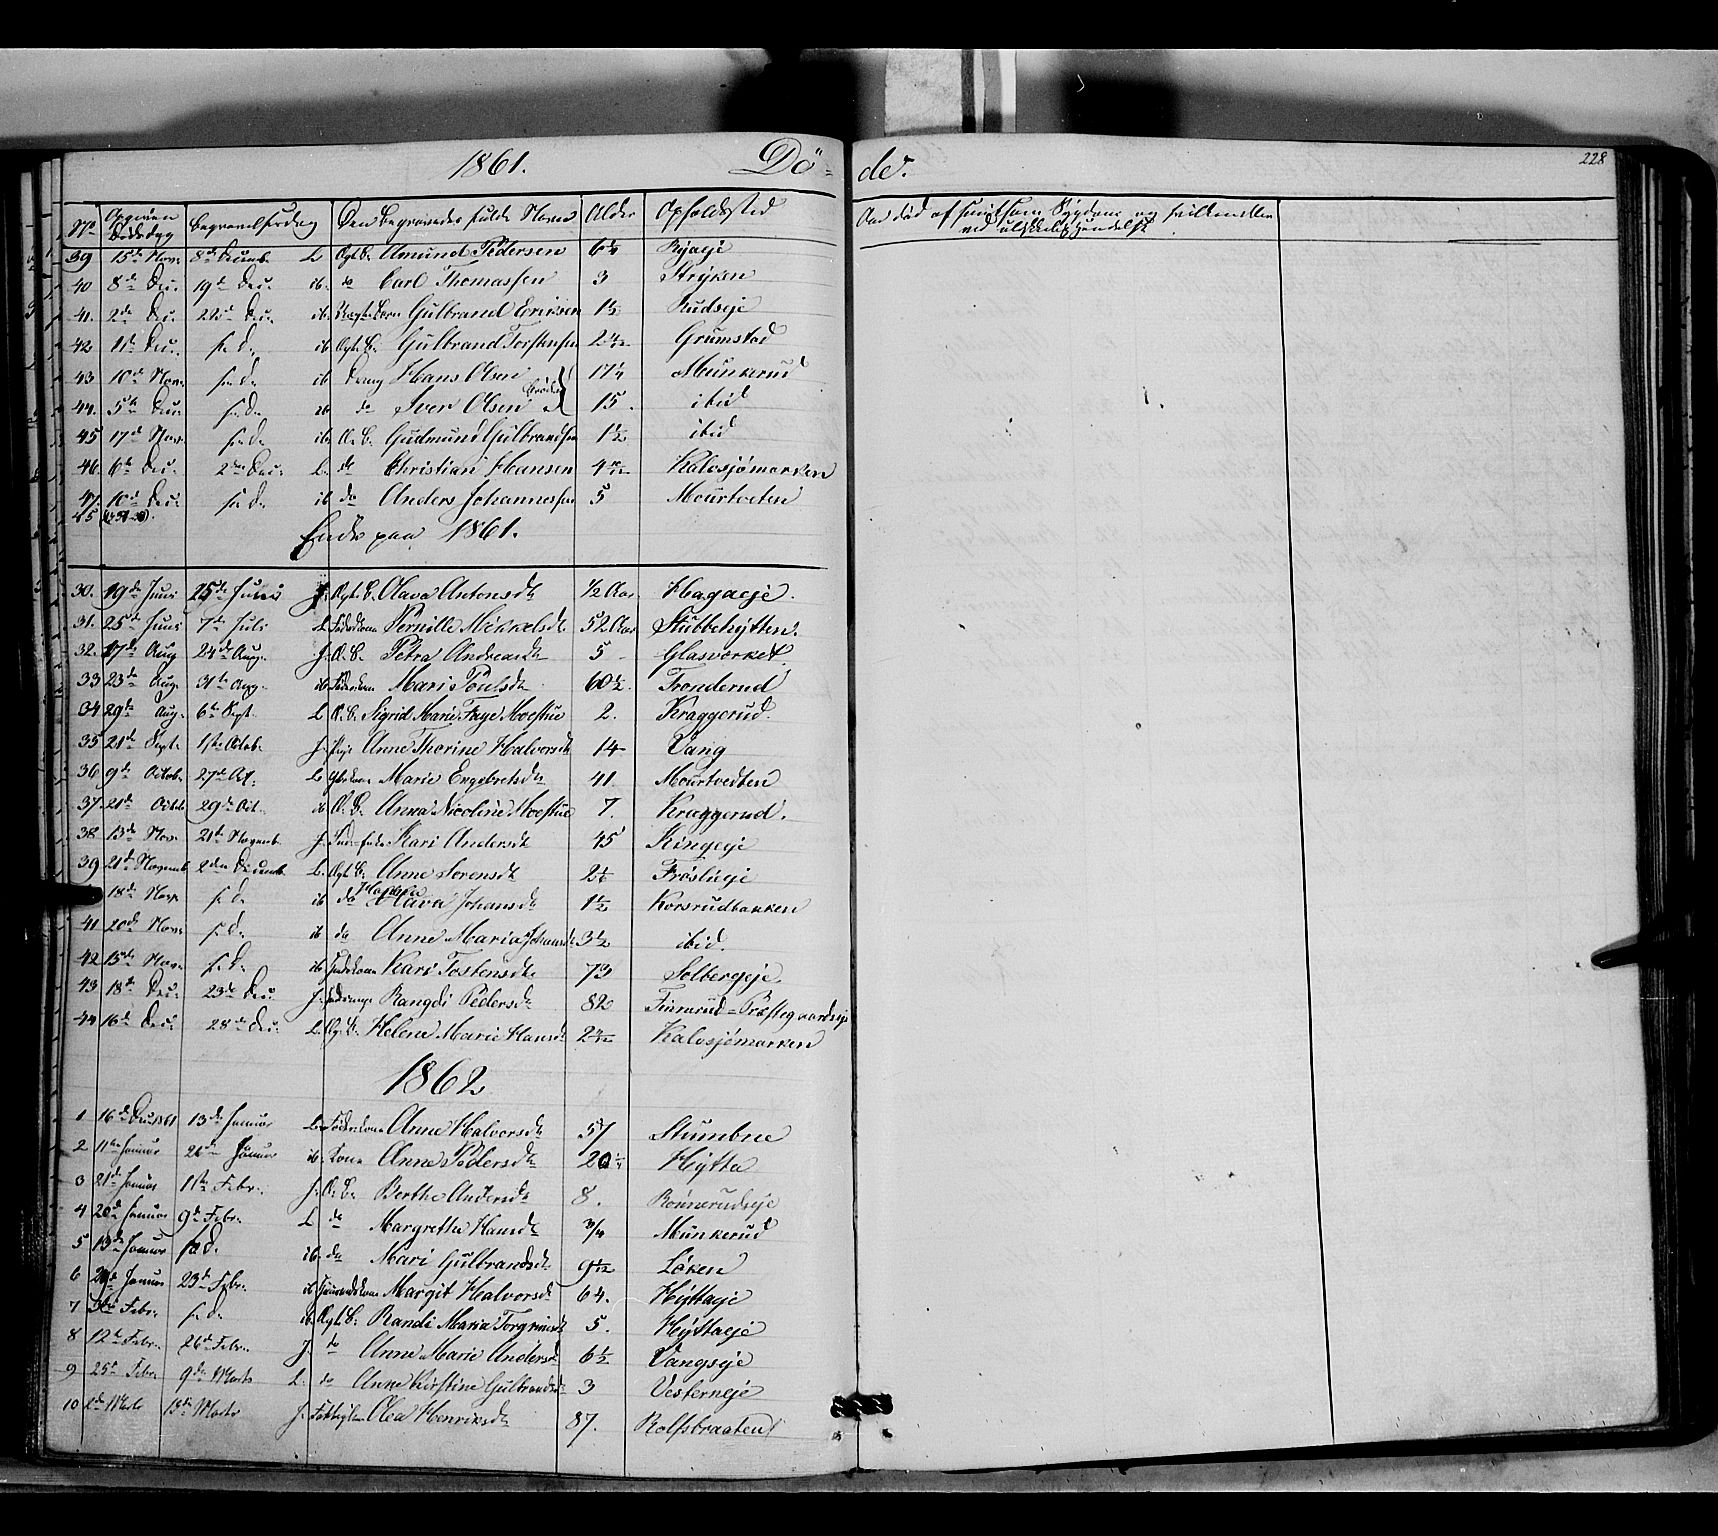 SAH, Jevnaker prestekontor, Ministerialbok nr. 7, 1858-1876, s. 228